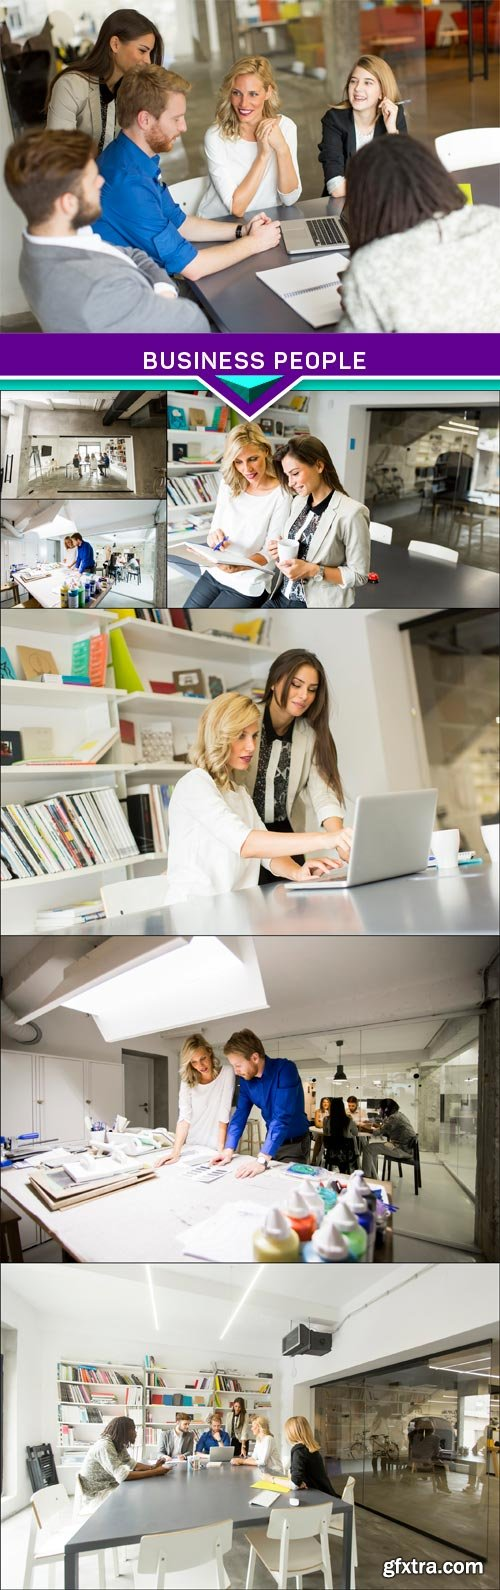 Business people 7x JPEG